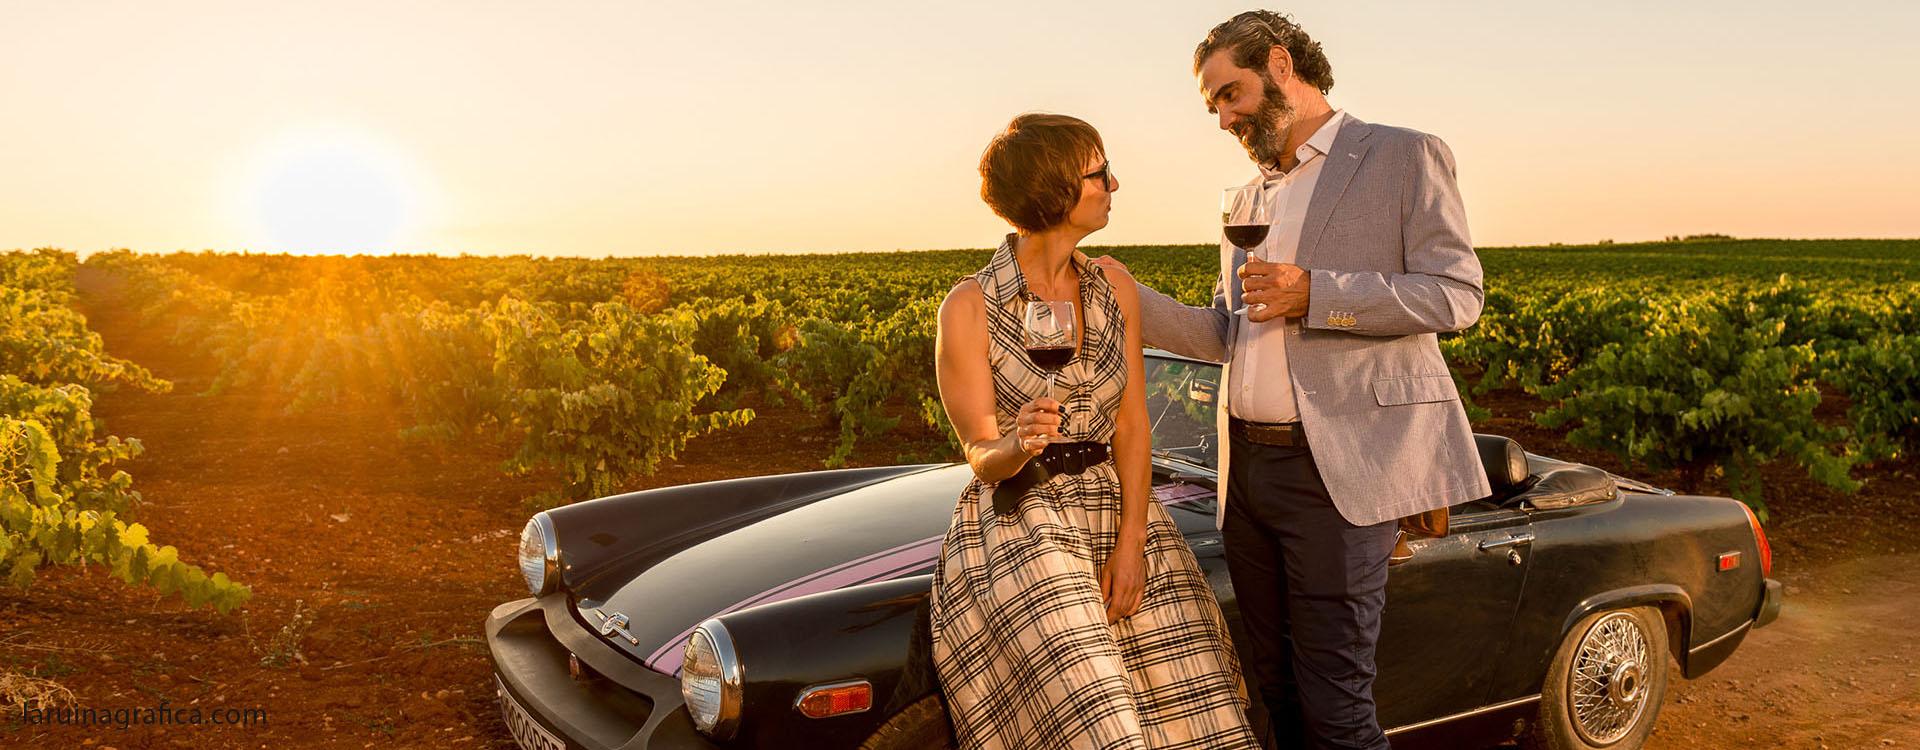 Romanticismo entre viñedos